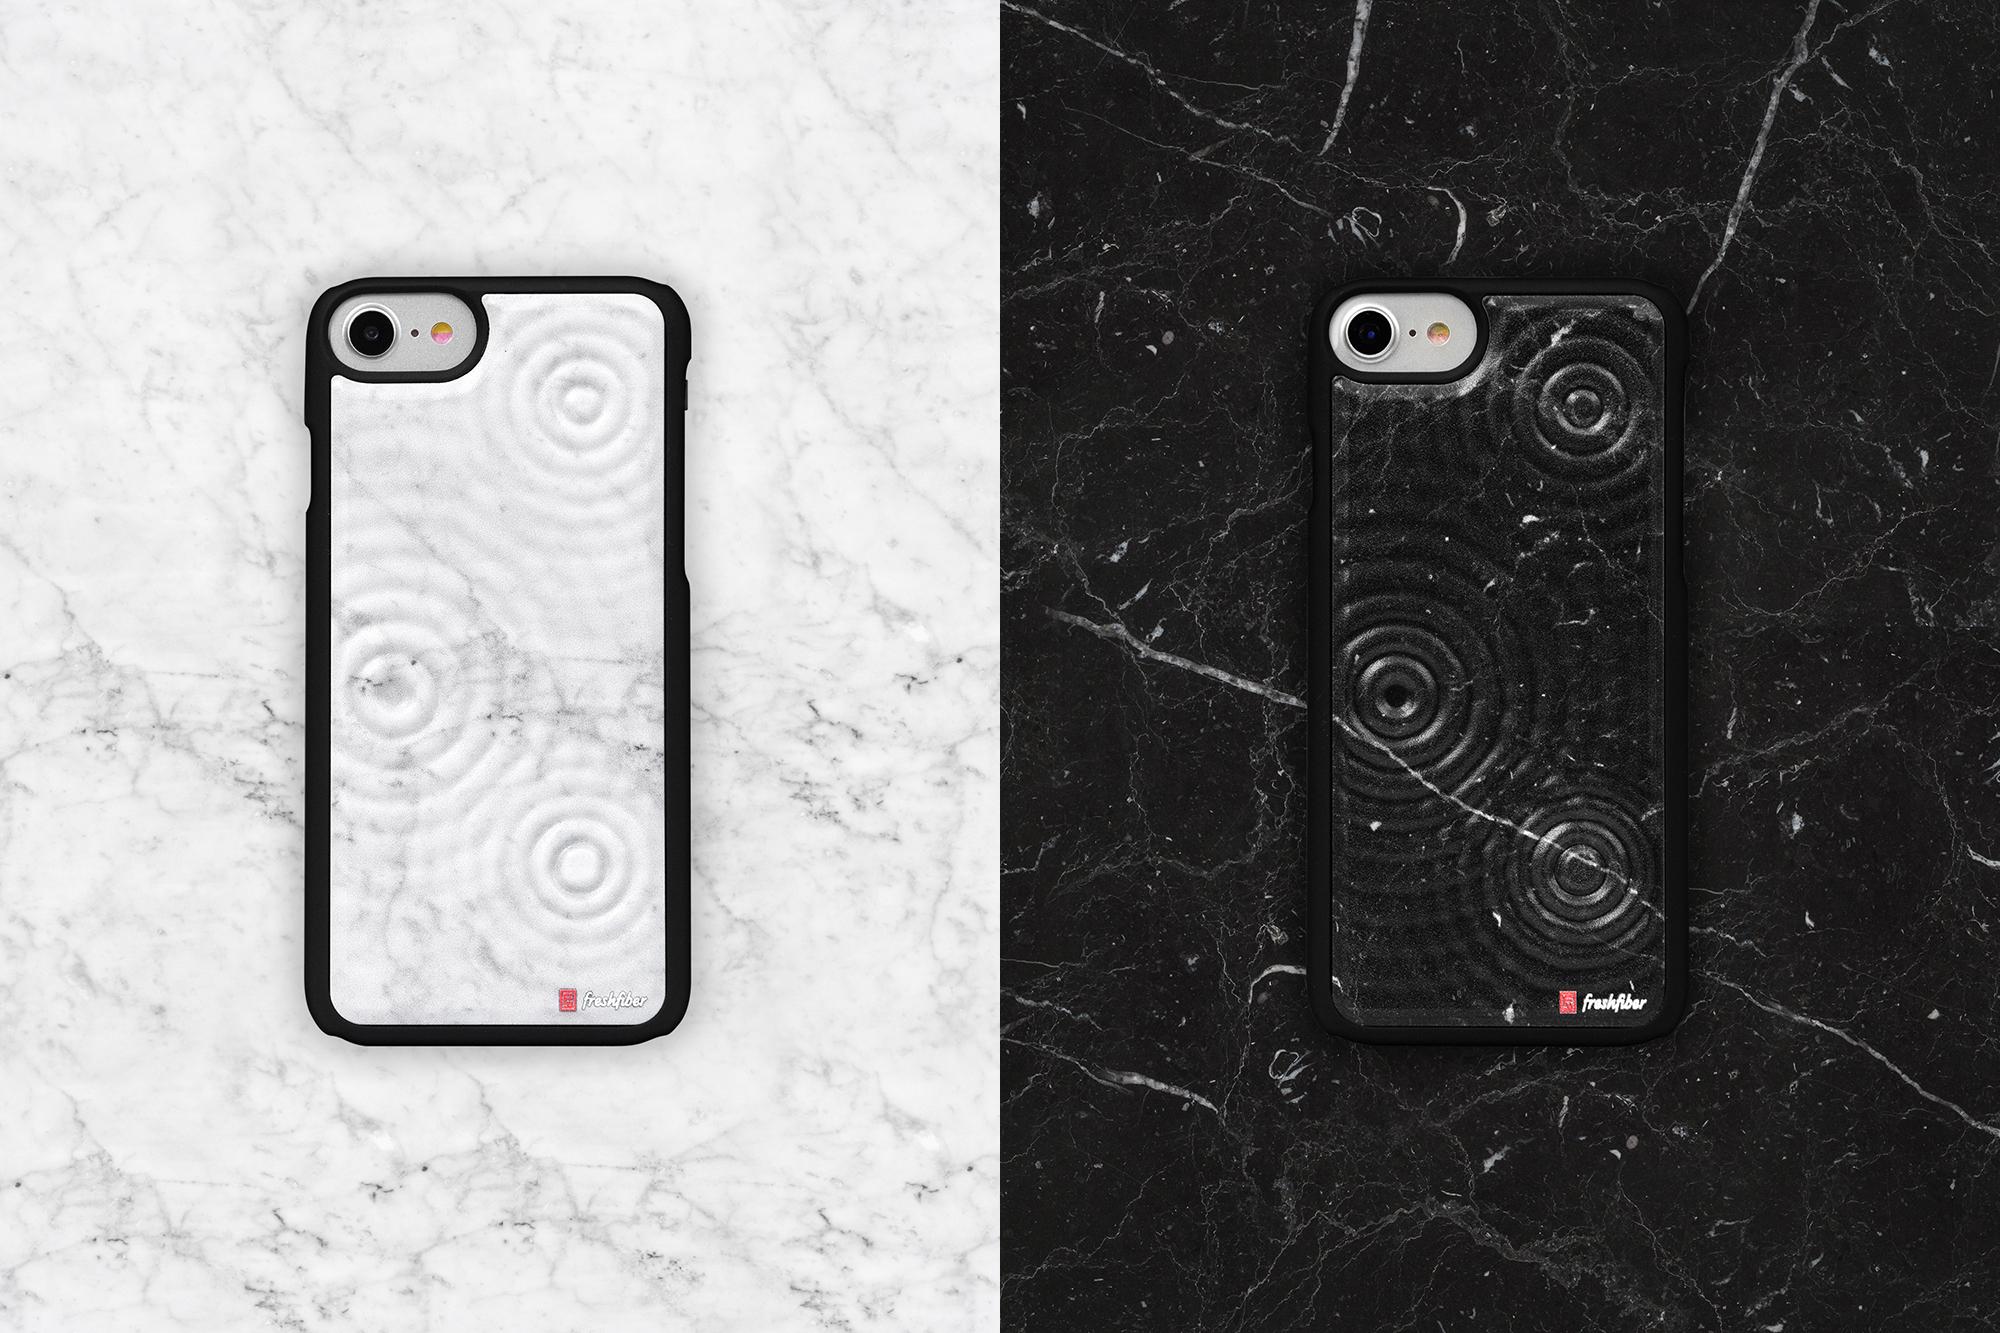 Tide Marble Nero & Tide Marble Carrara